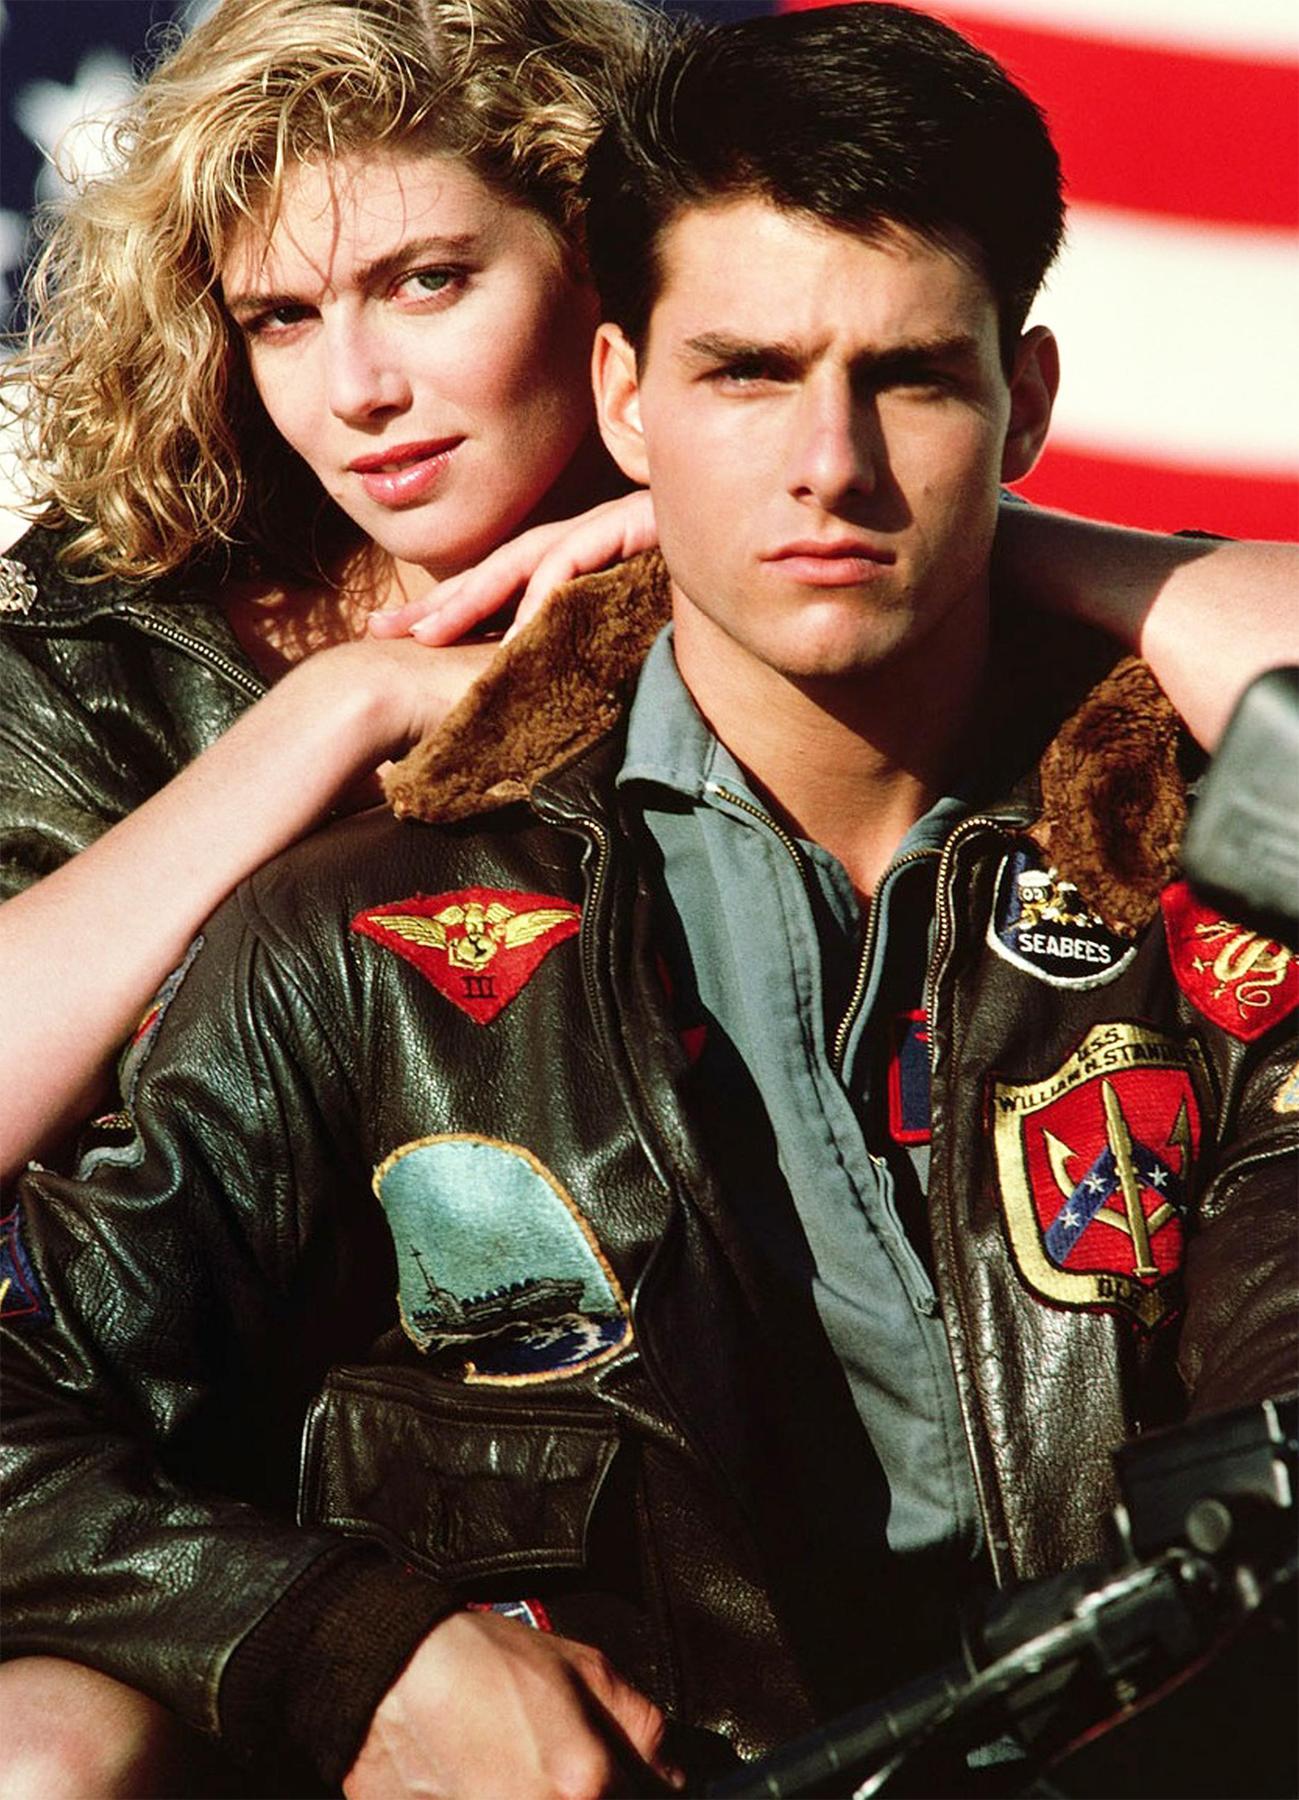 tom-cruise-top-gun-men-fighter-jet-pilot-bomber-leather-jacket-11